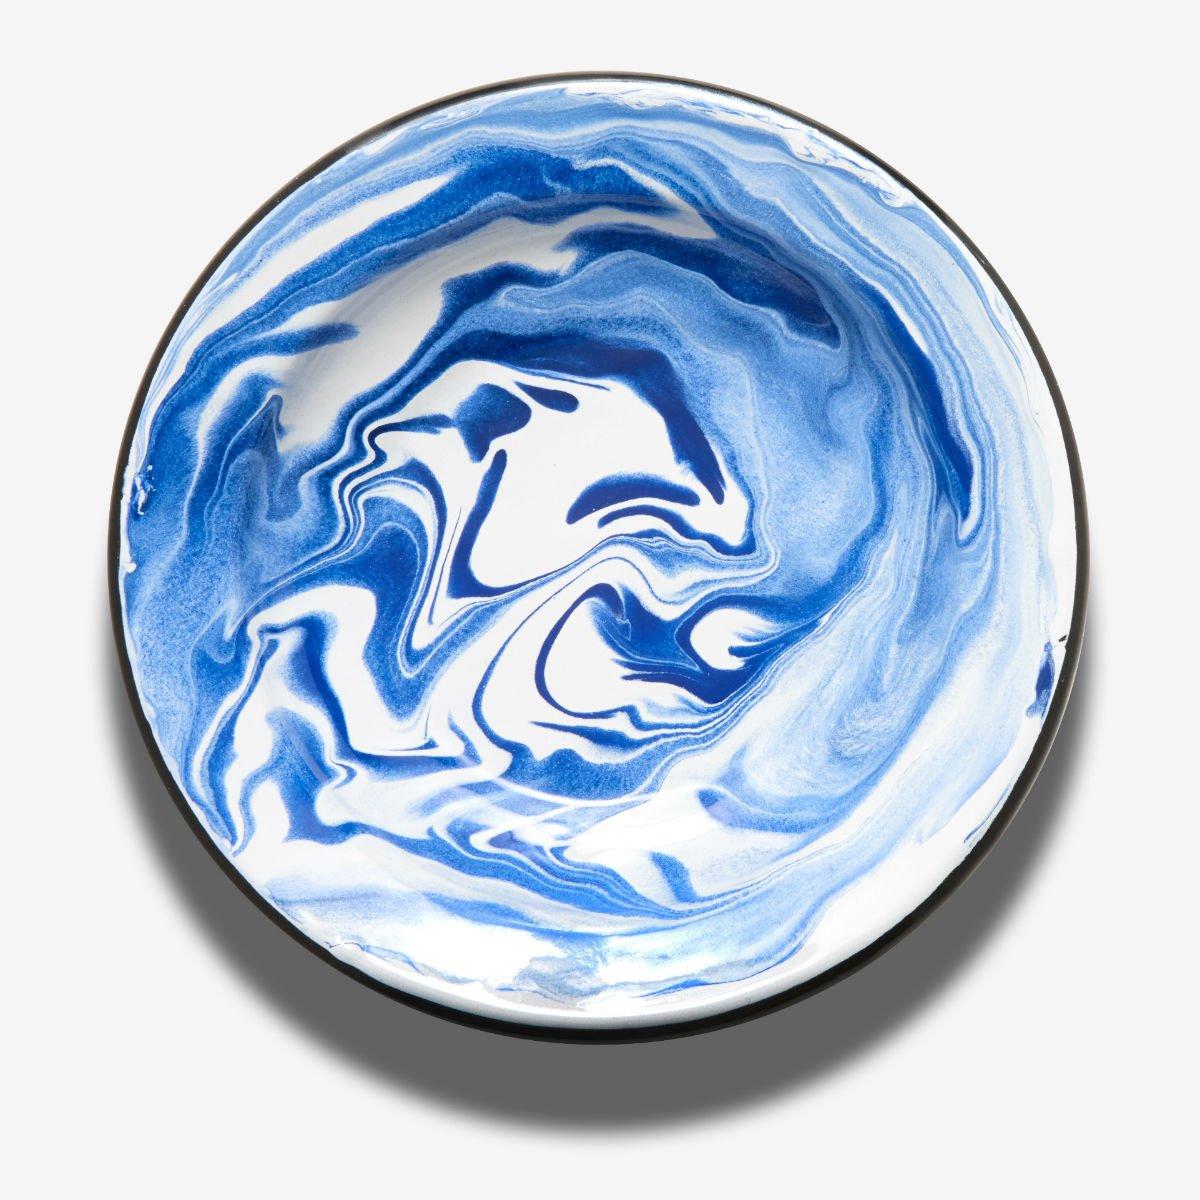 Hluboký modrý talíř BORNN